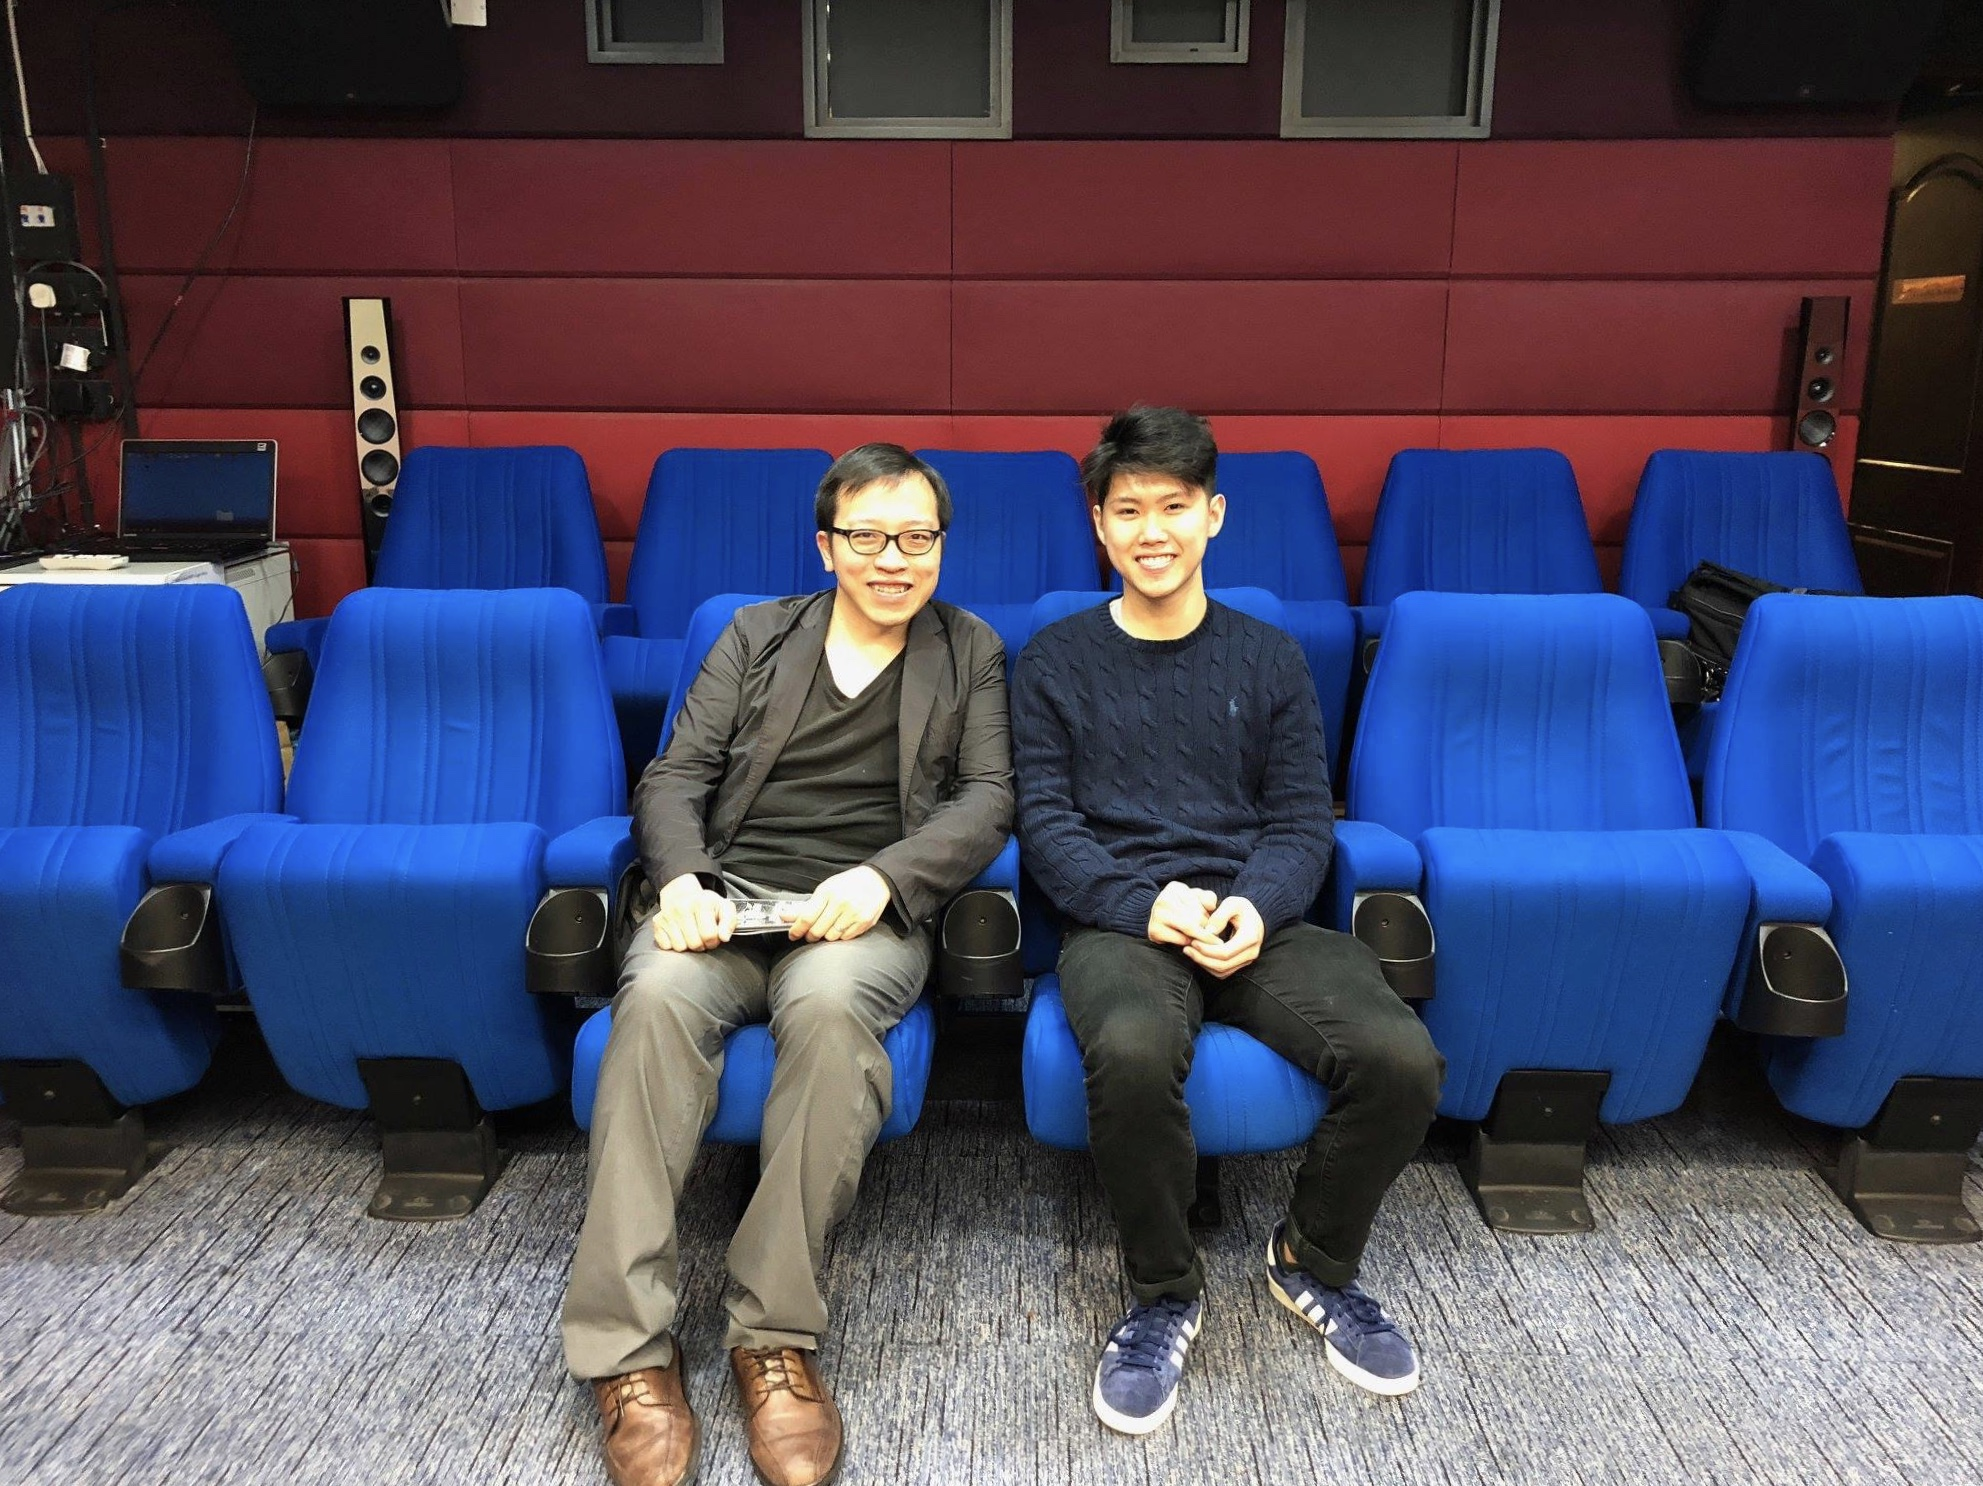 Copy of Copy of Copy of Copy of Copy of Copy of Bye Bye Germany Nicholas Zhang Kaifeng Jews Film Screening Simon Li Hong Kong HK Holocaust and Tolerance Centre Center